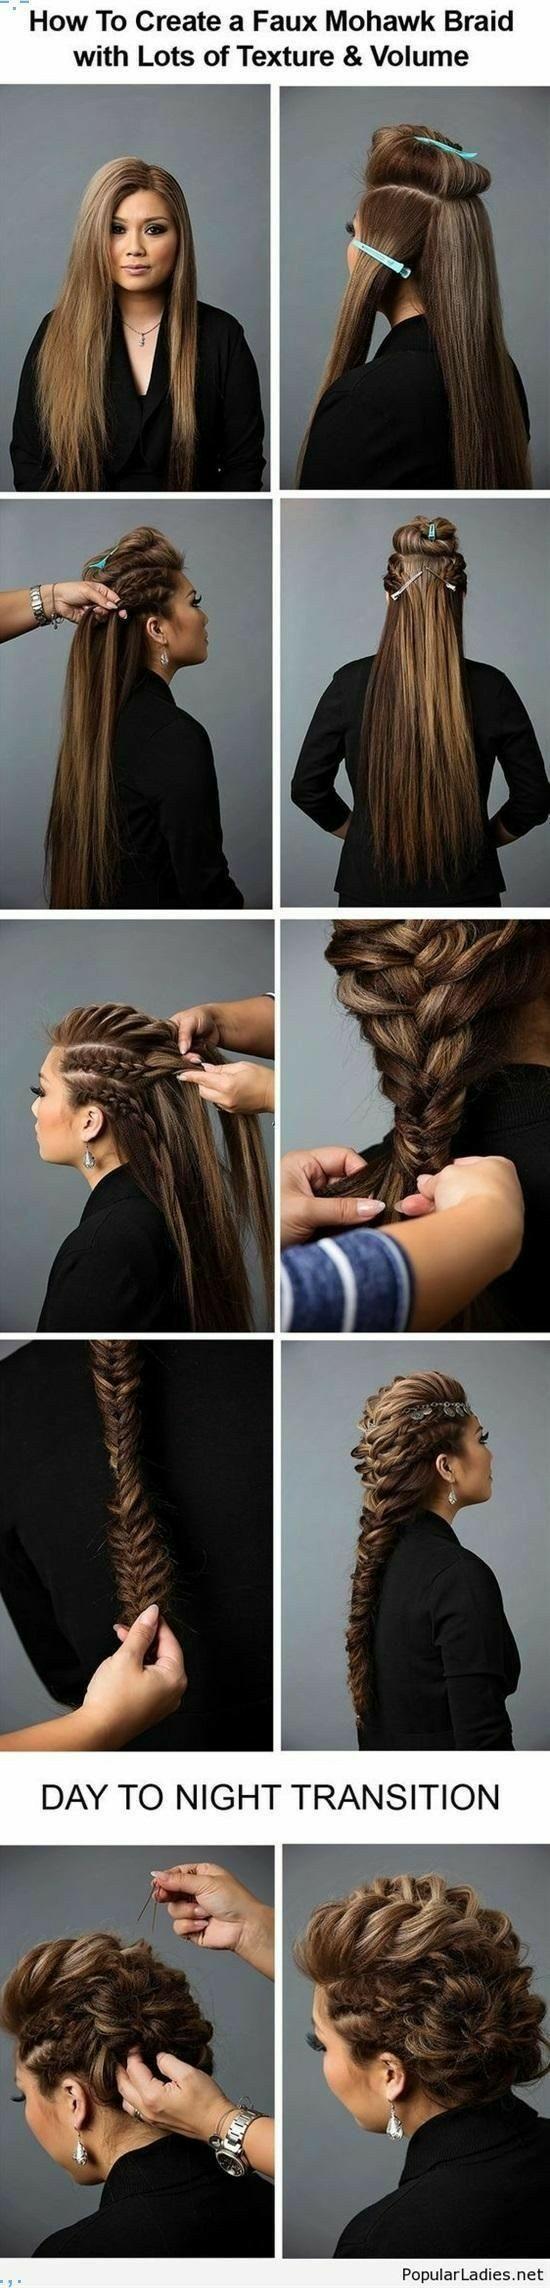 Pin by kira balderas on hair in pinterest hair hair styles